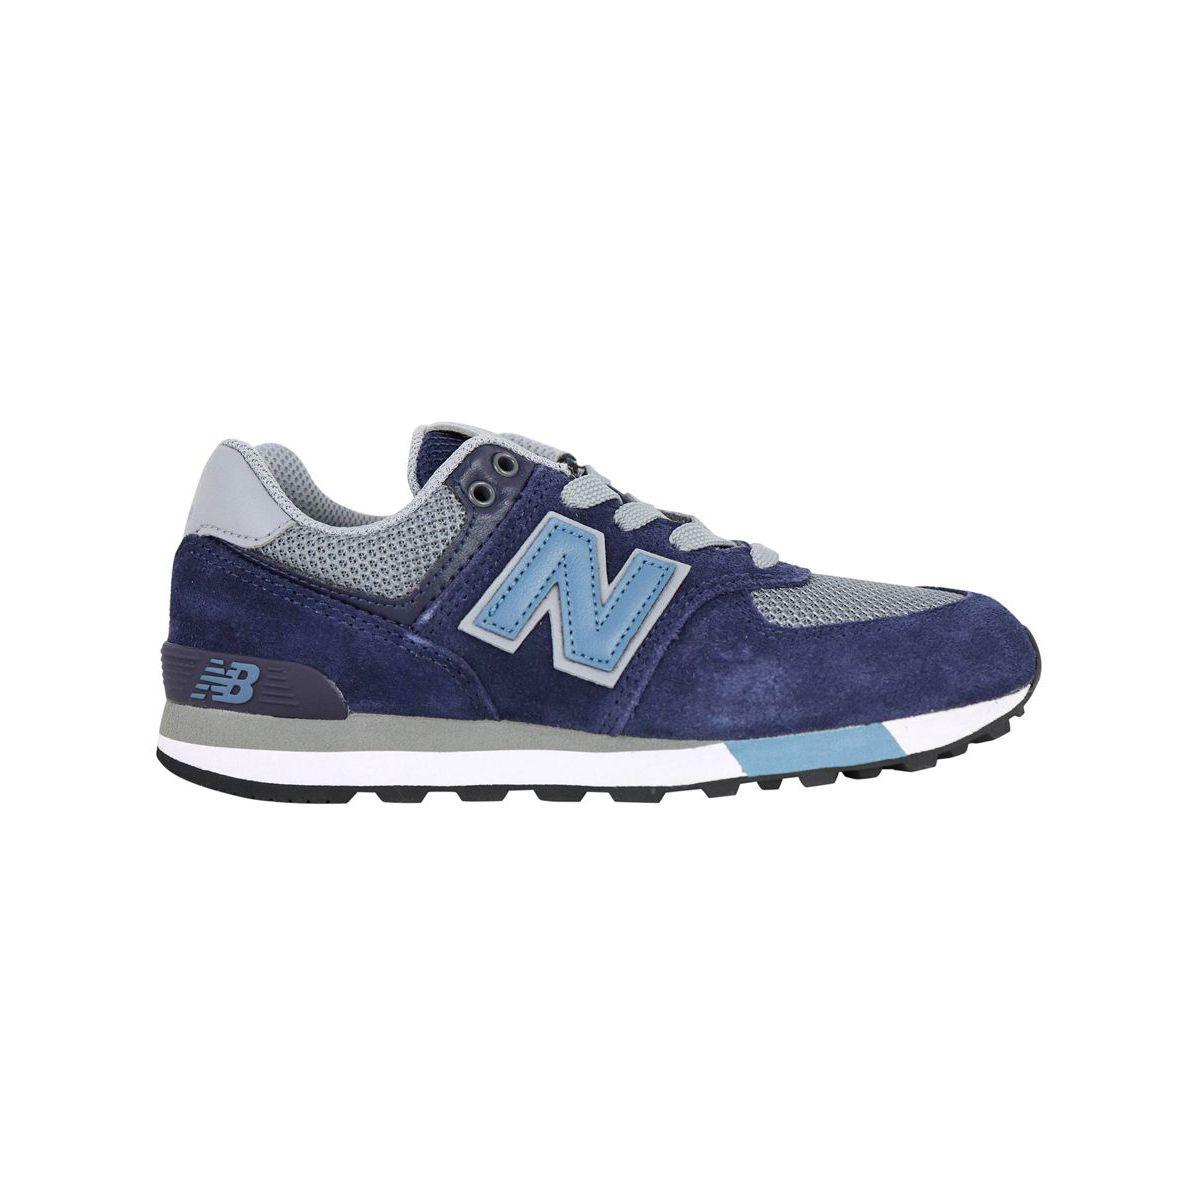 Senakers PC574FND Blue / gray New Balance